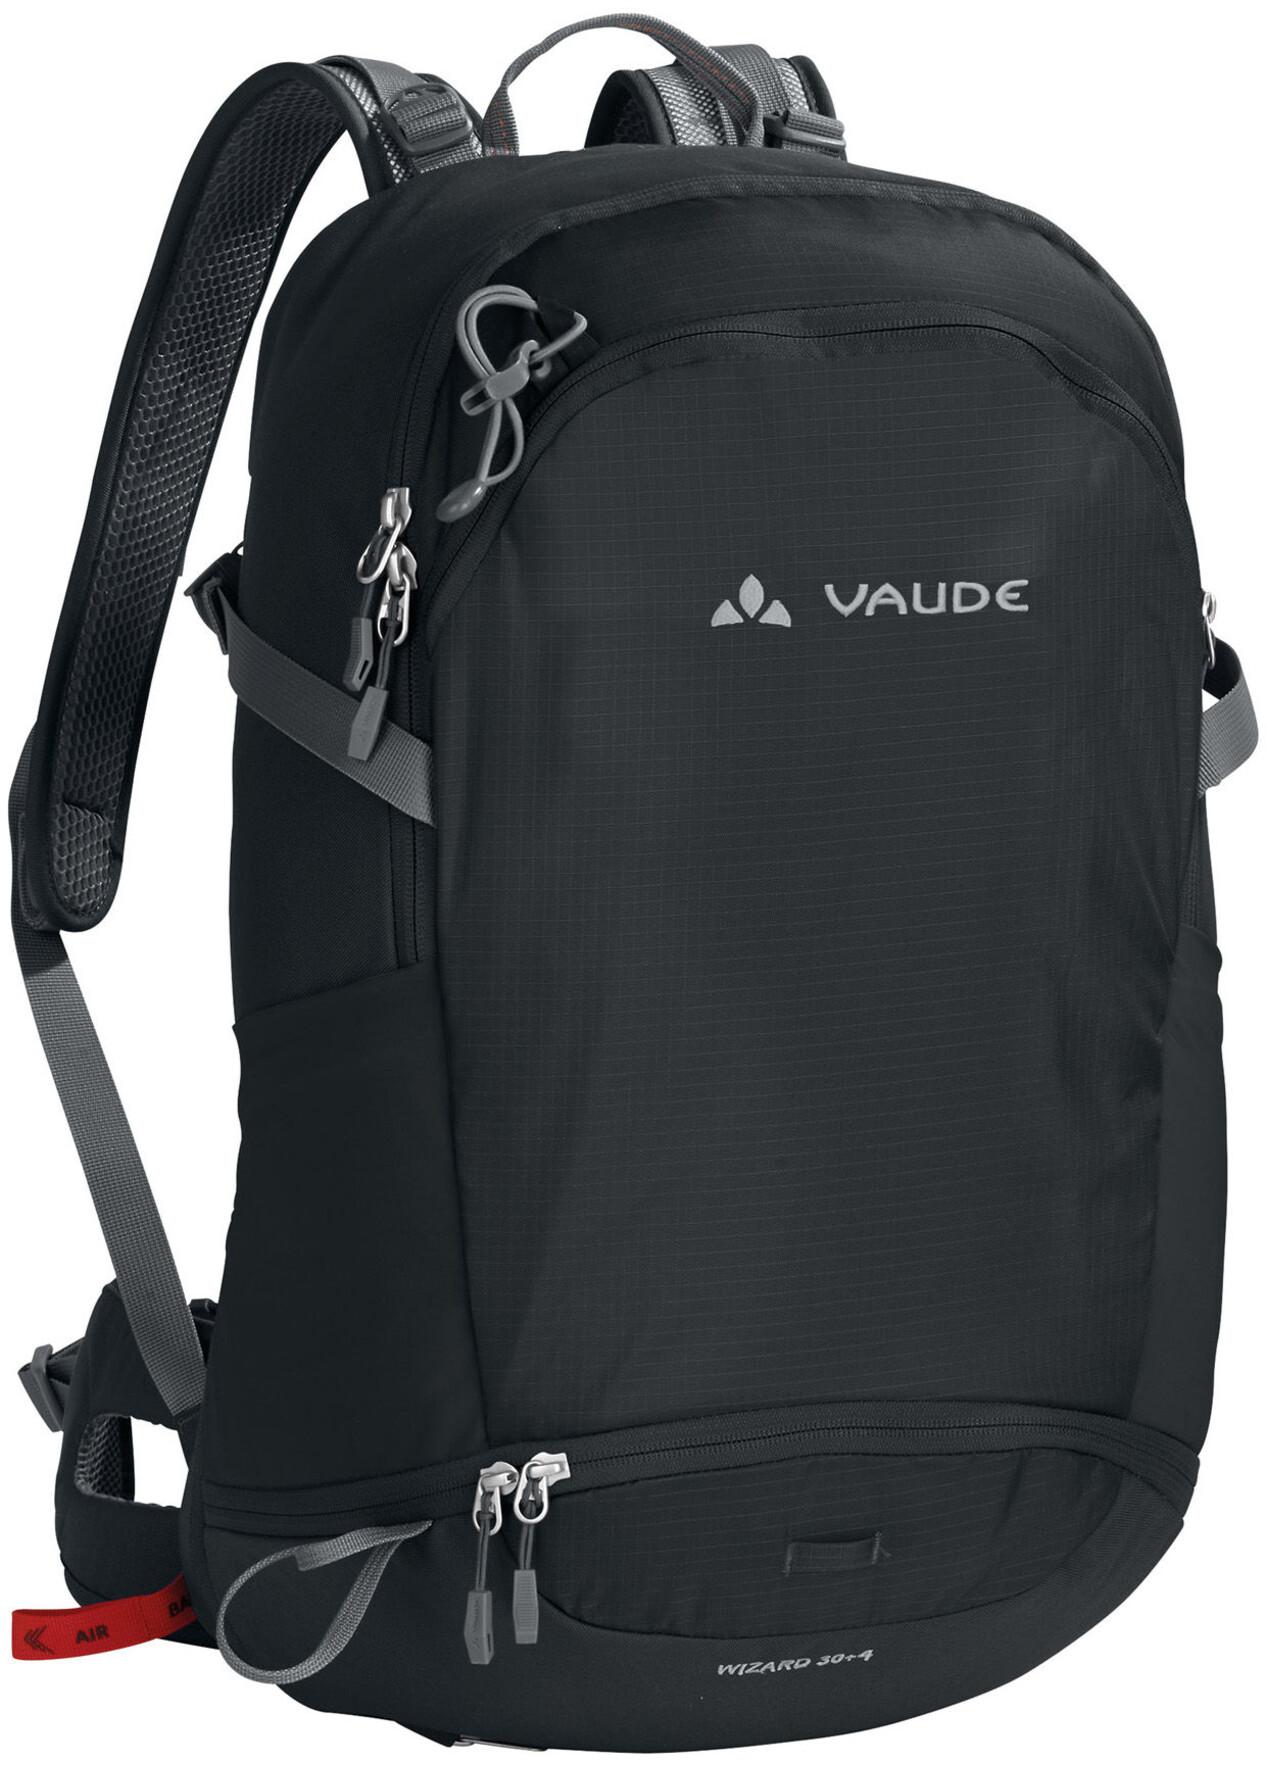 VAUDE Wizard 30+4 - Mochila - negro  f77ffd3492431